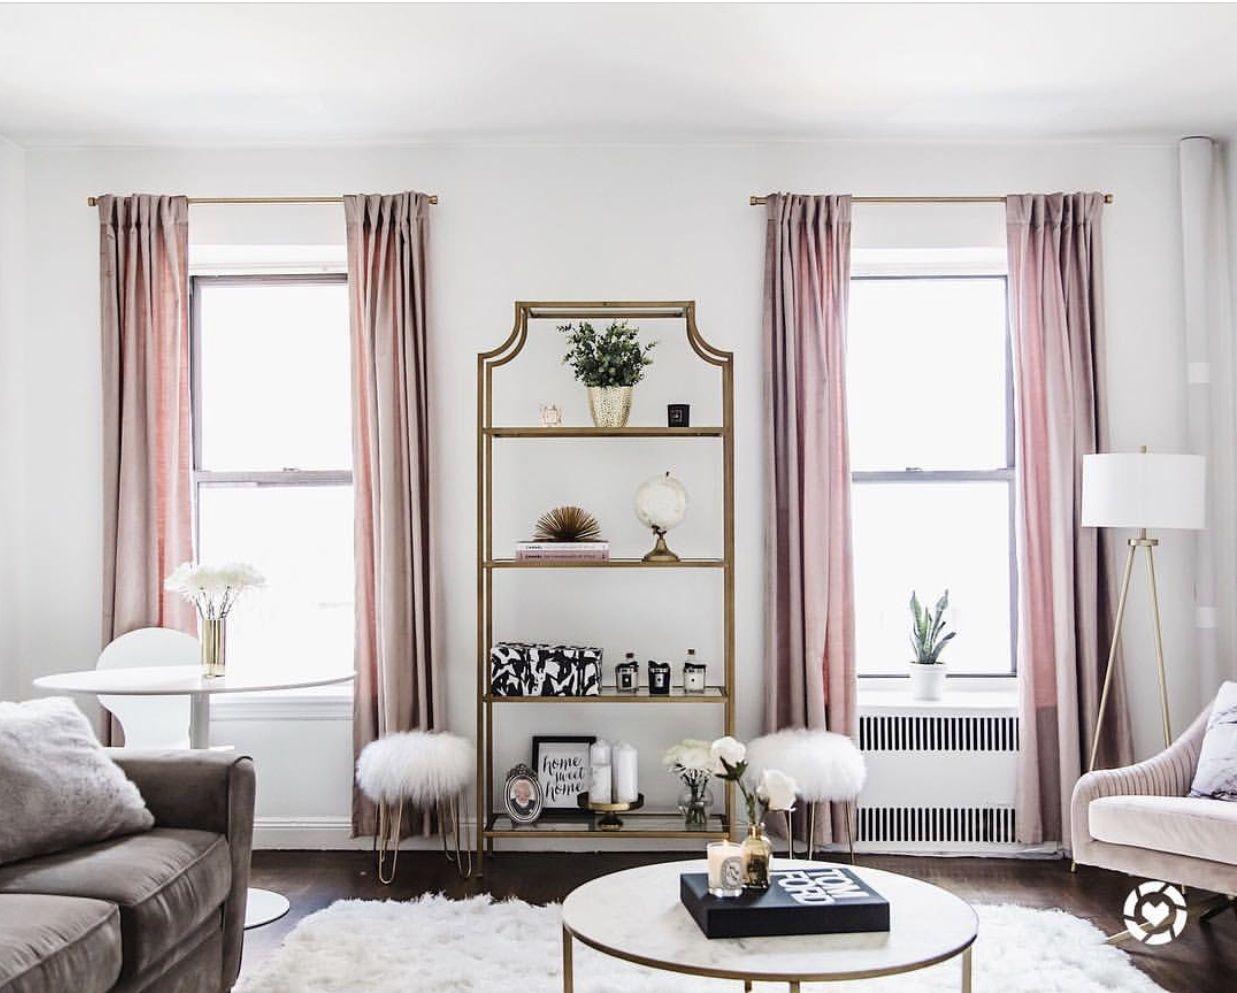 Living Room Design By @retroflame | West Elm Item: Dusty Blush Cotton  Luster Velvet